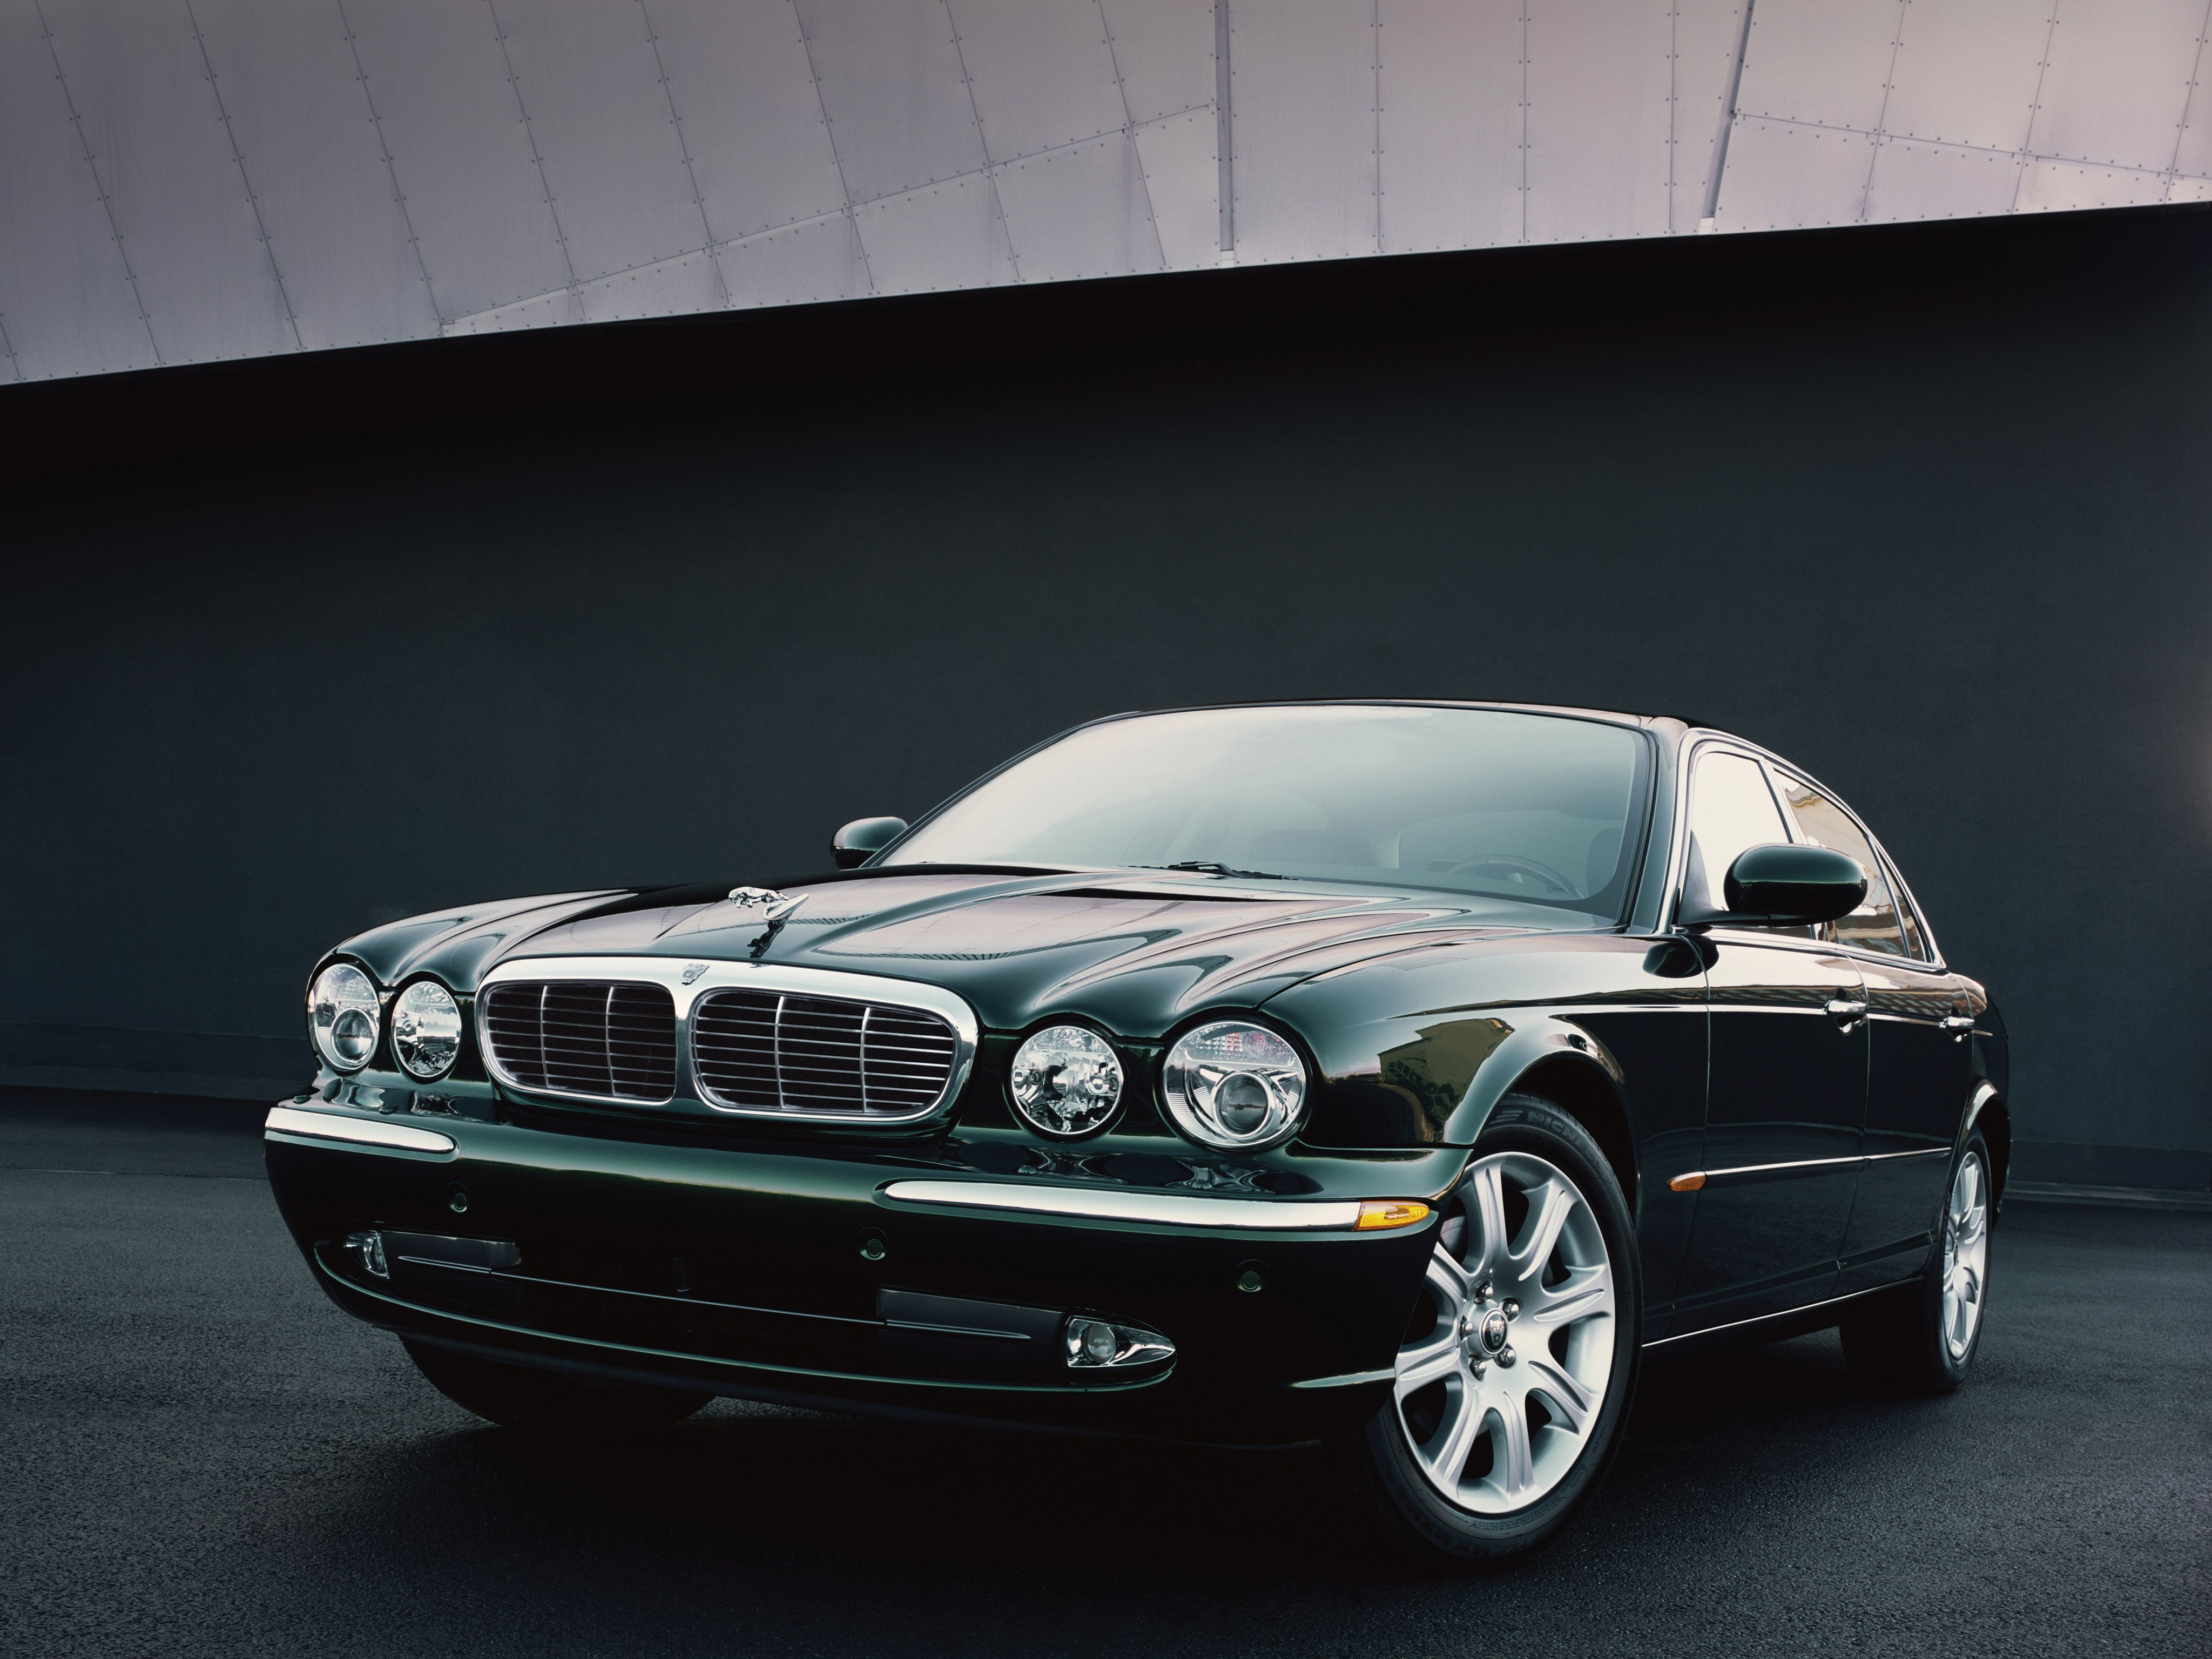 2004 07 Jaguar Xj8 Lwb X350 Jaguar Daimler Jaguar Car Jaguar Xj